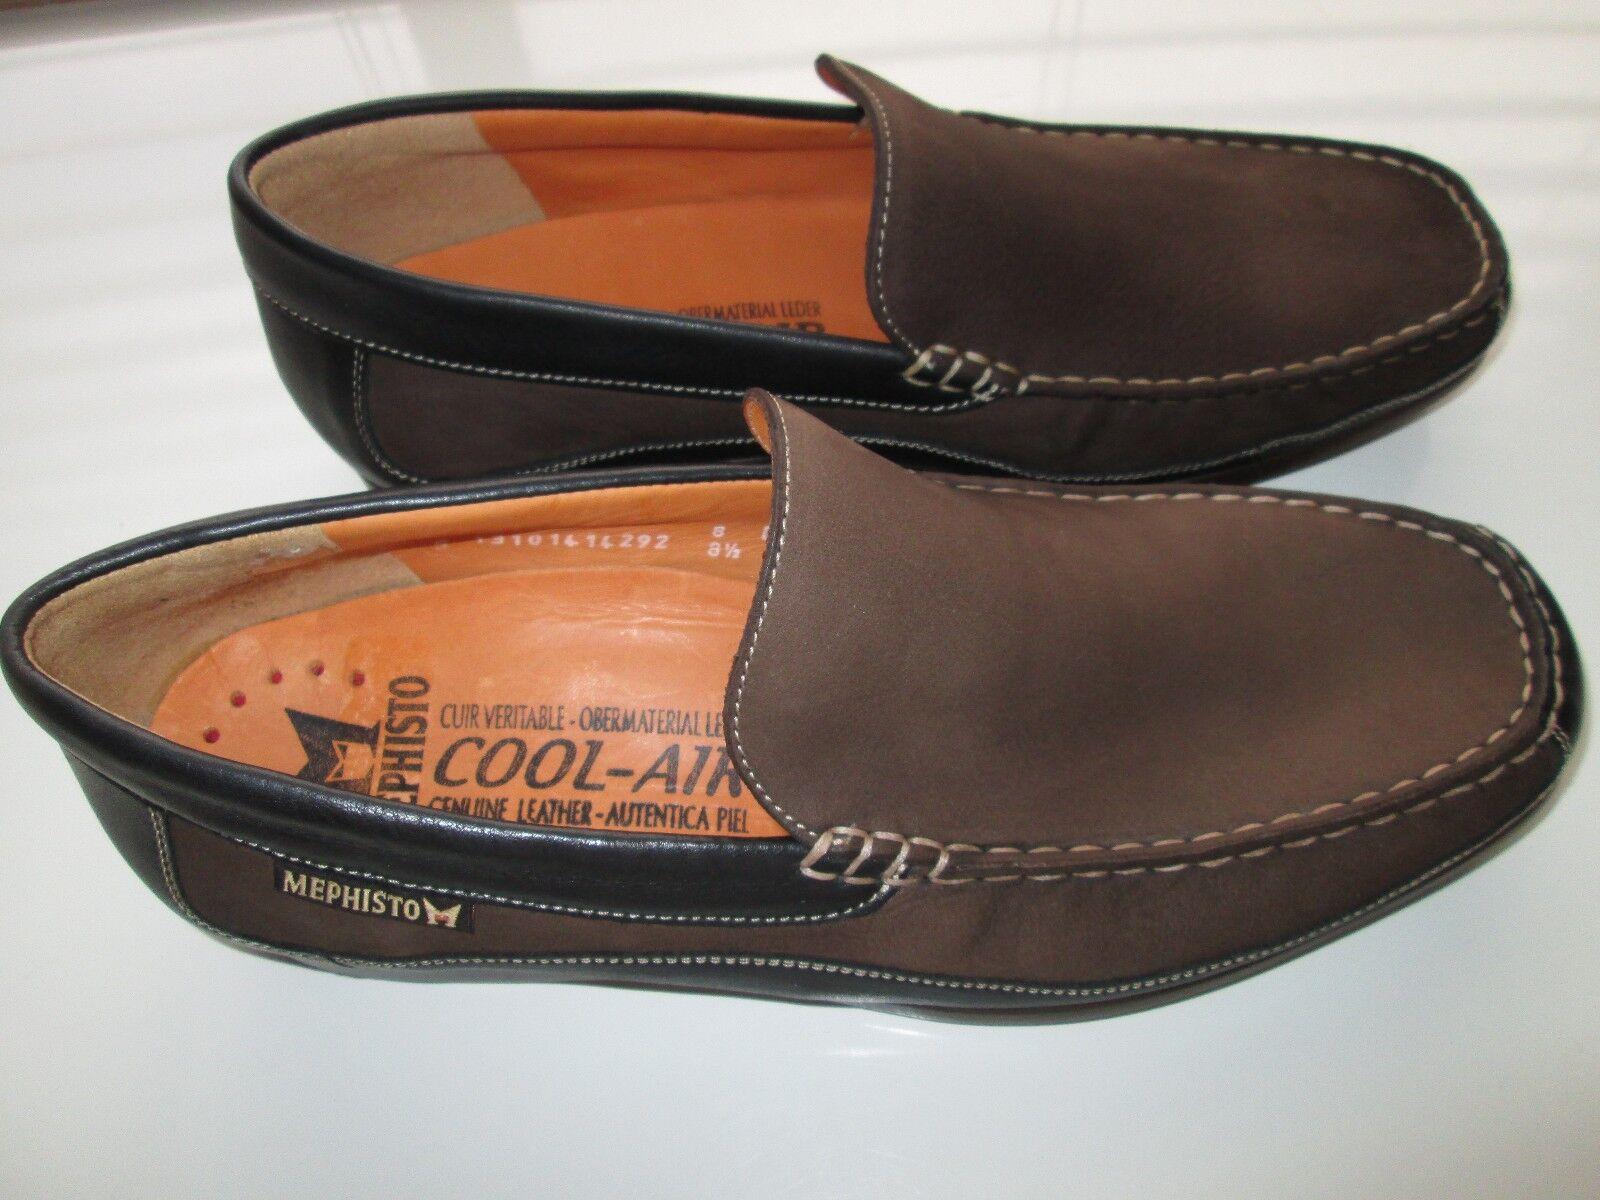 Mephisto 13101414292 Baduard Slip-On Men's Loafer Shoes Brown 9E-9.5M MSRP